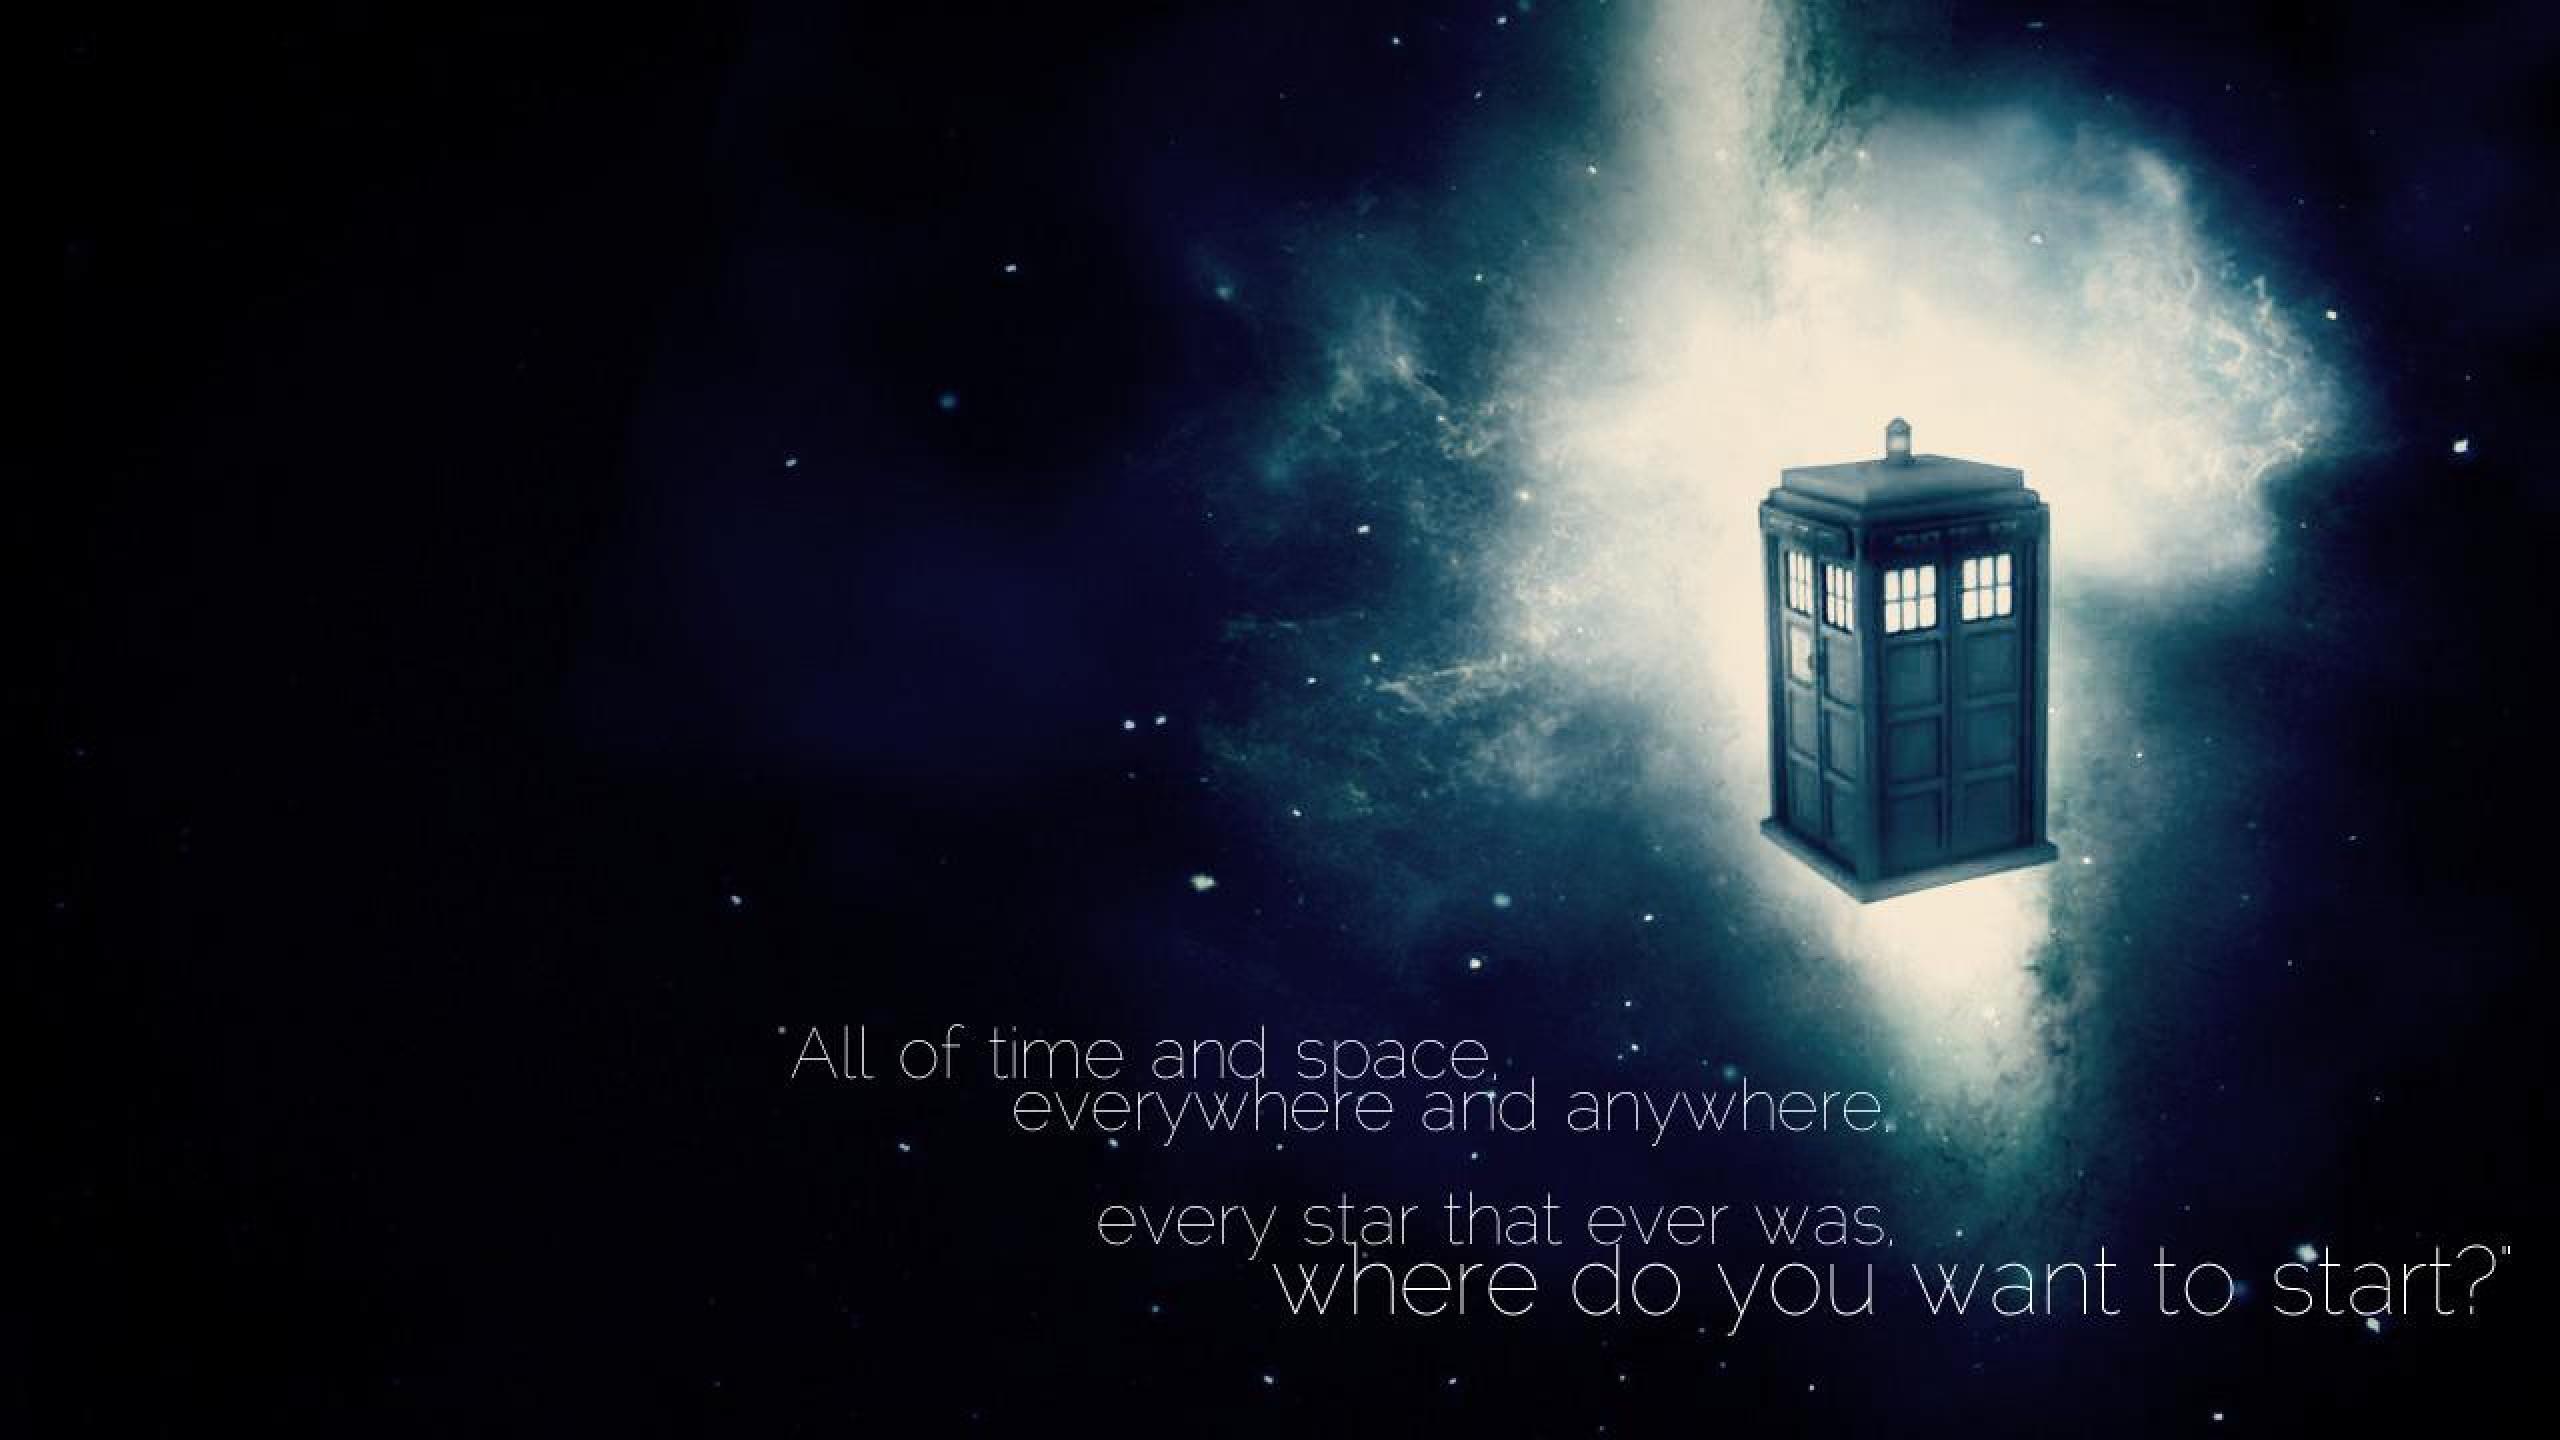 Doctor Who Ipad wallpaper – 1078488